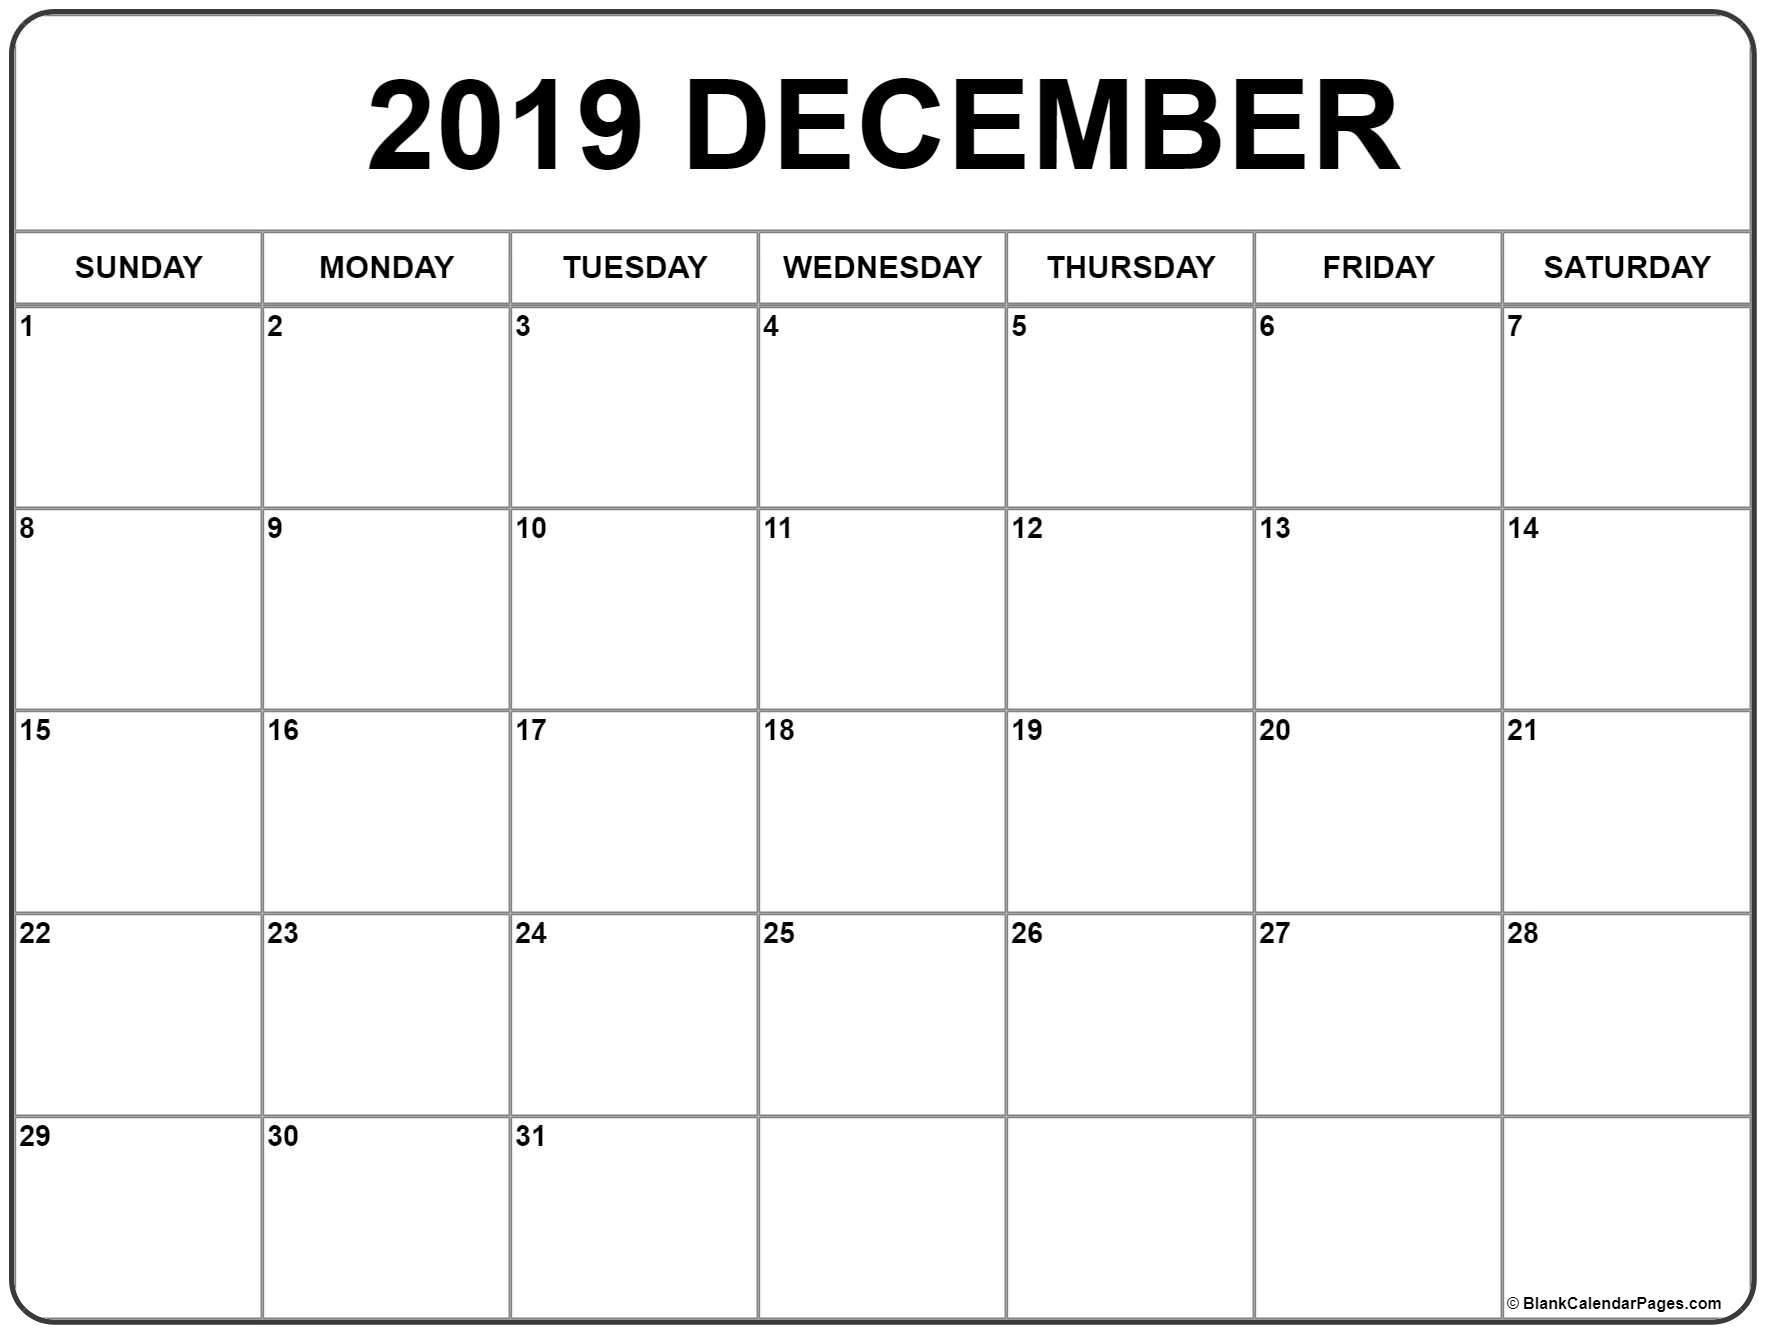 December 2019 Calendar | Free Printable Monthly Calendars